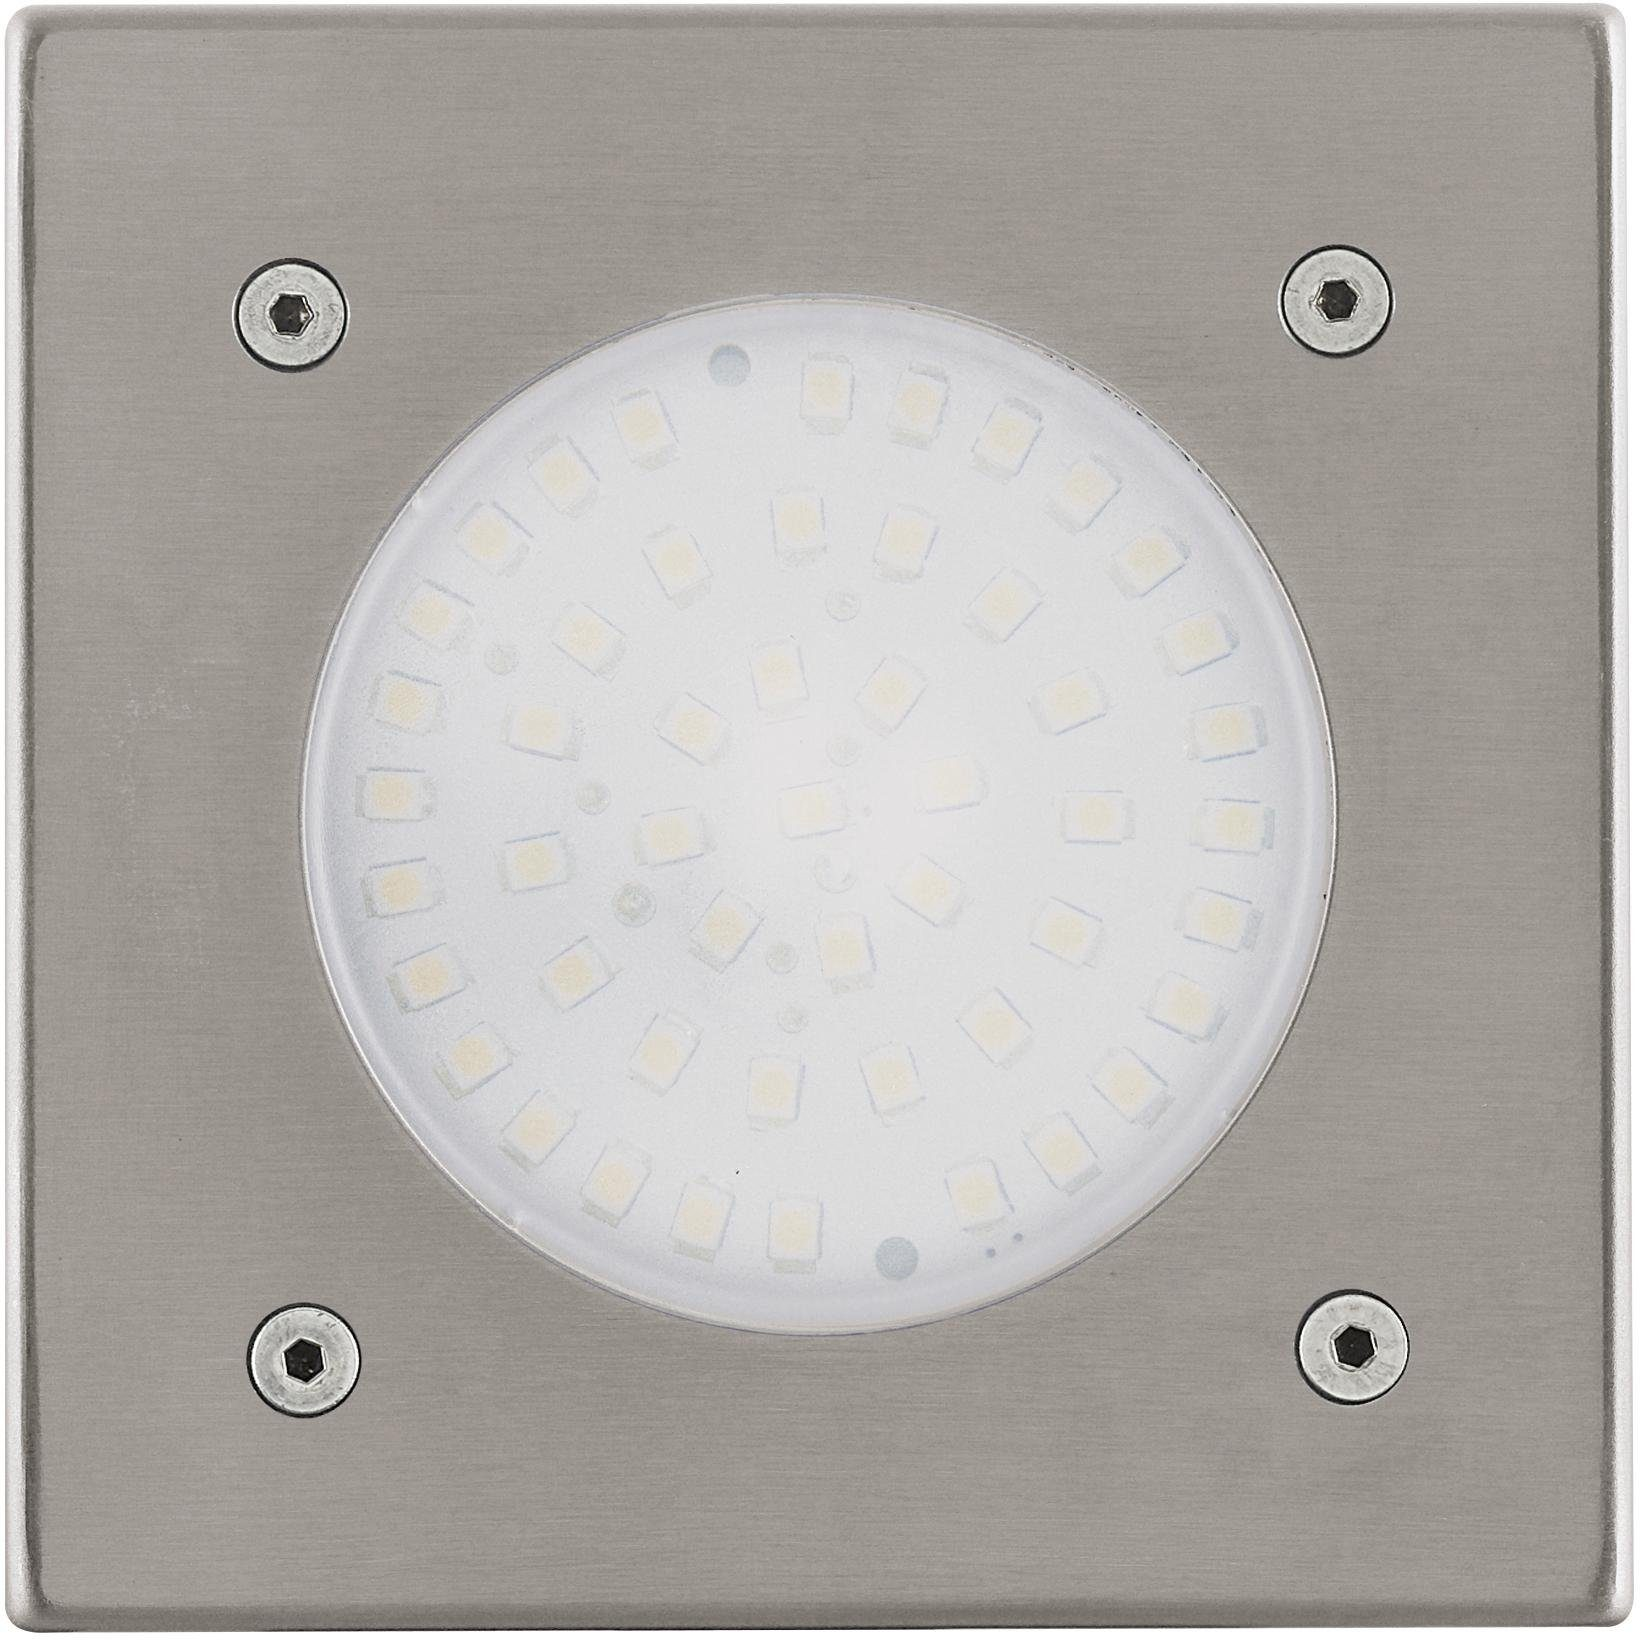 EGLO LED Einbauleuchte »LAMEDO«, 1-flammig, LED Bodeneinbauleuchte - Outdoor